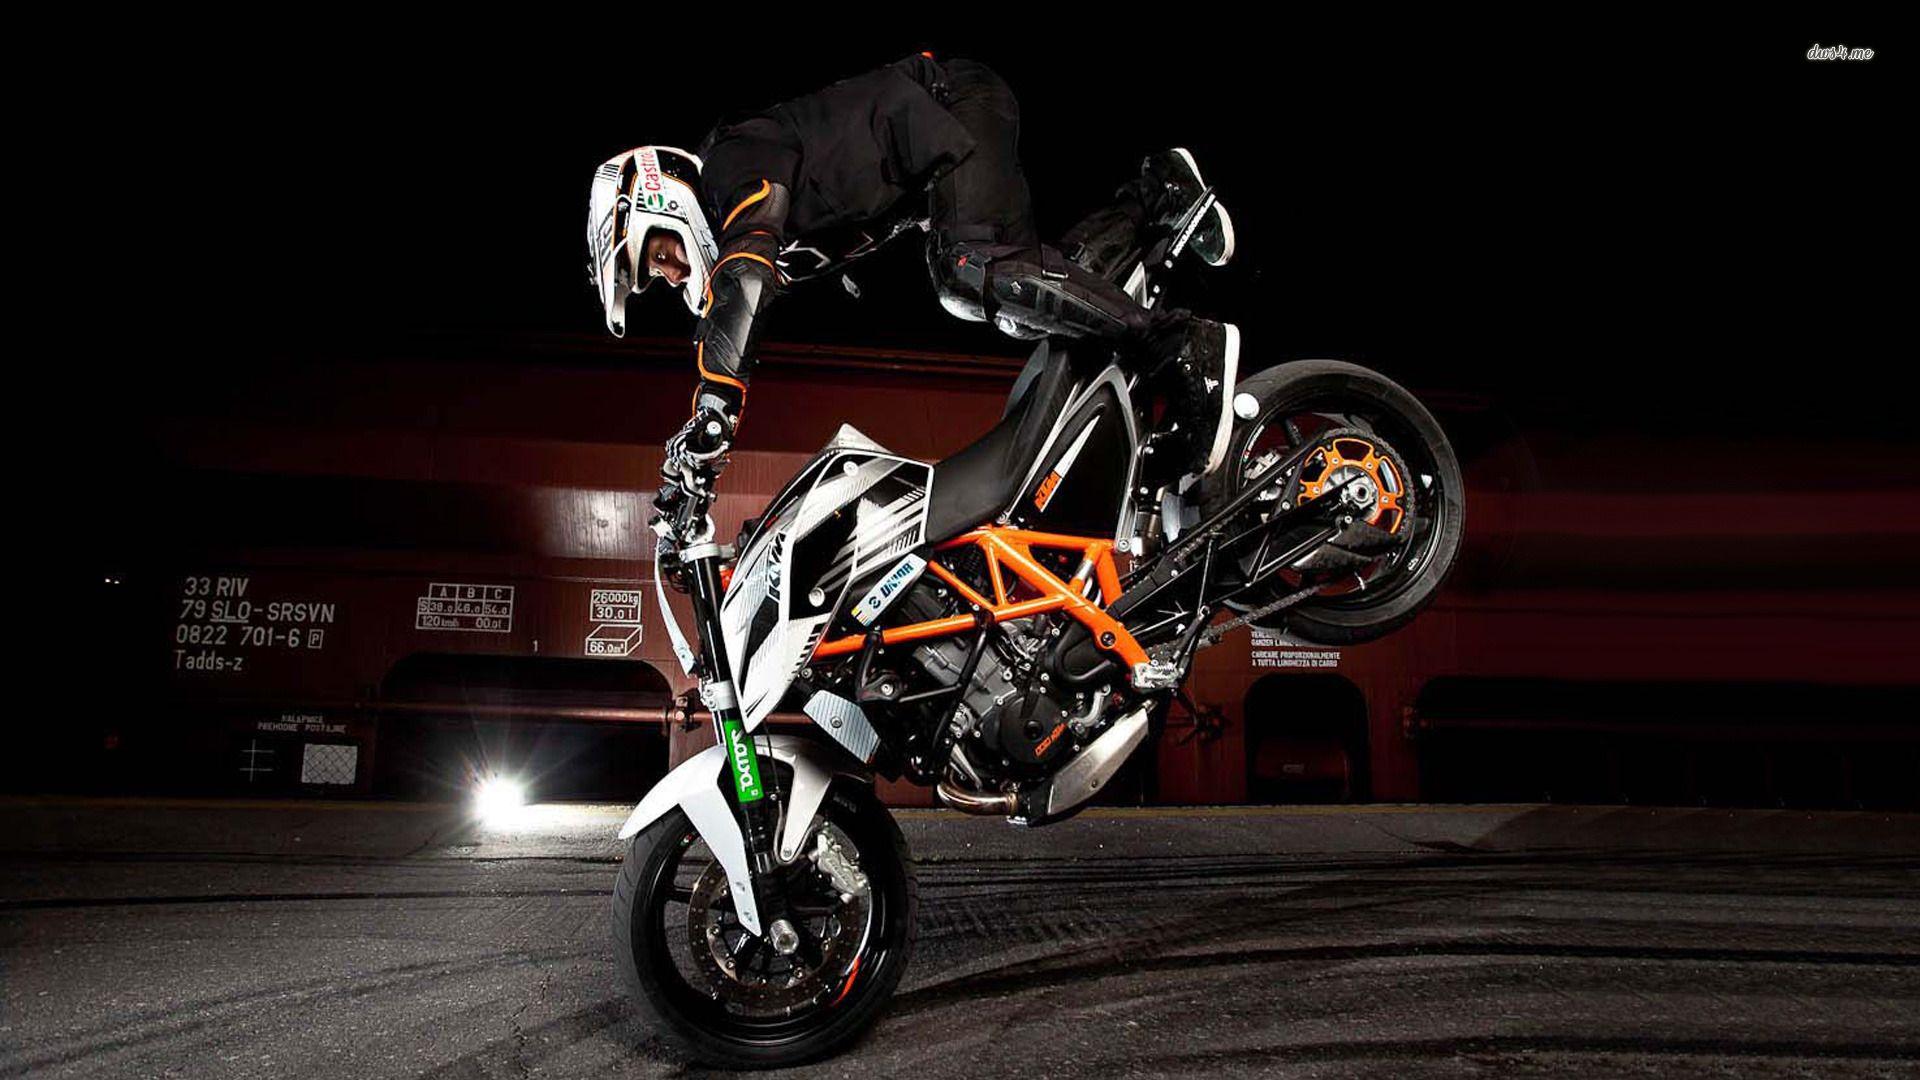 Supermoto ktm 690 stunt concept bikemotorcycletuned car tuning car - 11006 Ktm Duke 125 1920 1080 Motorcycle Wallpaper Stunt Bikemotorcycle Wallpaperktm Dukecar